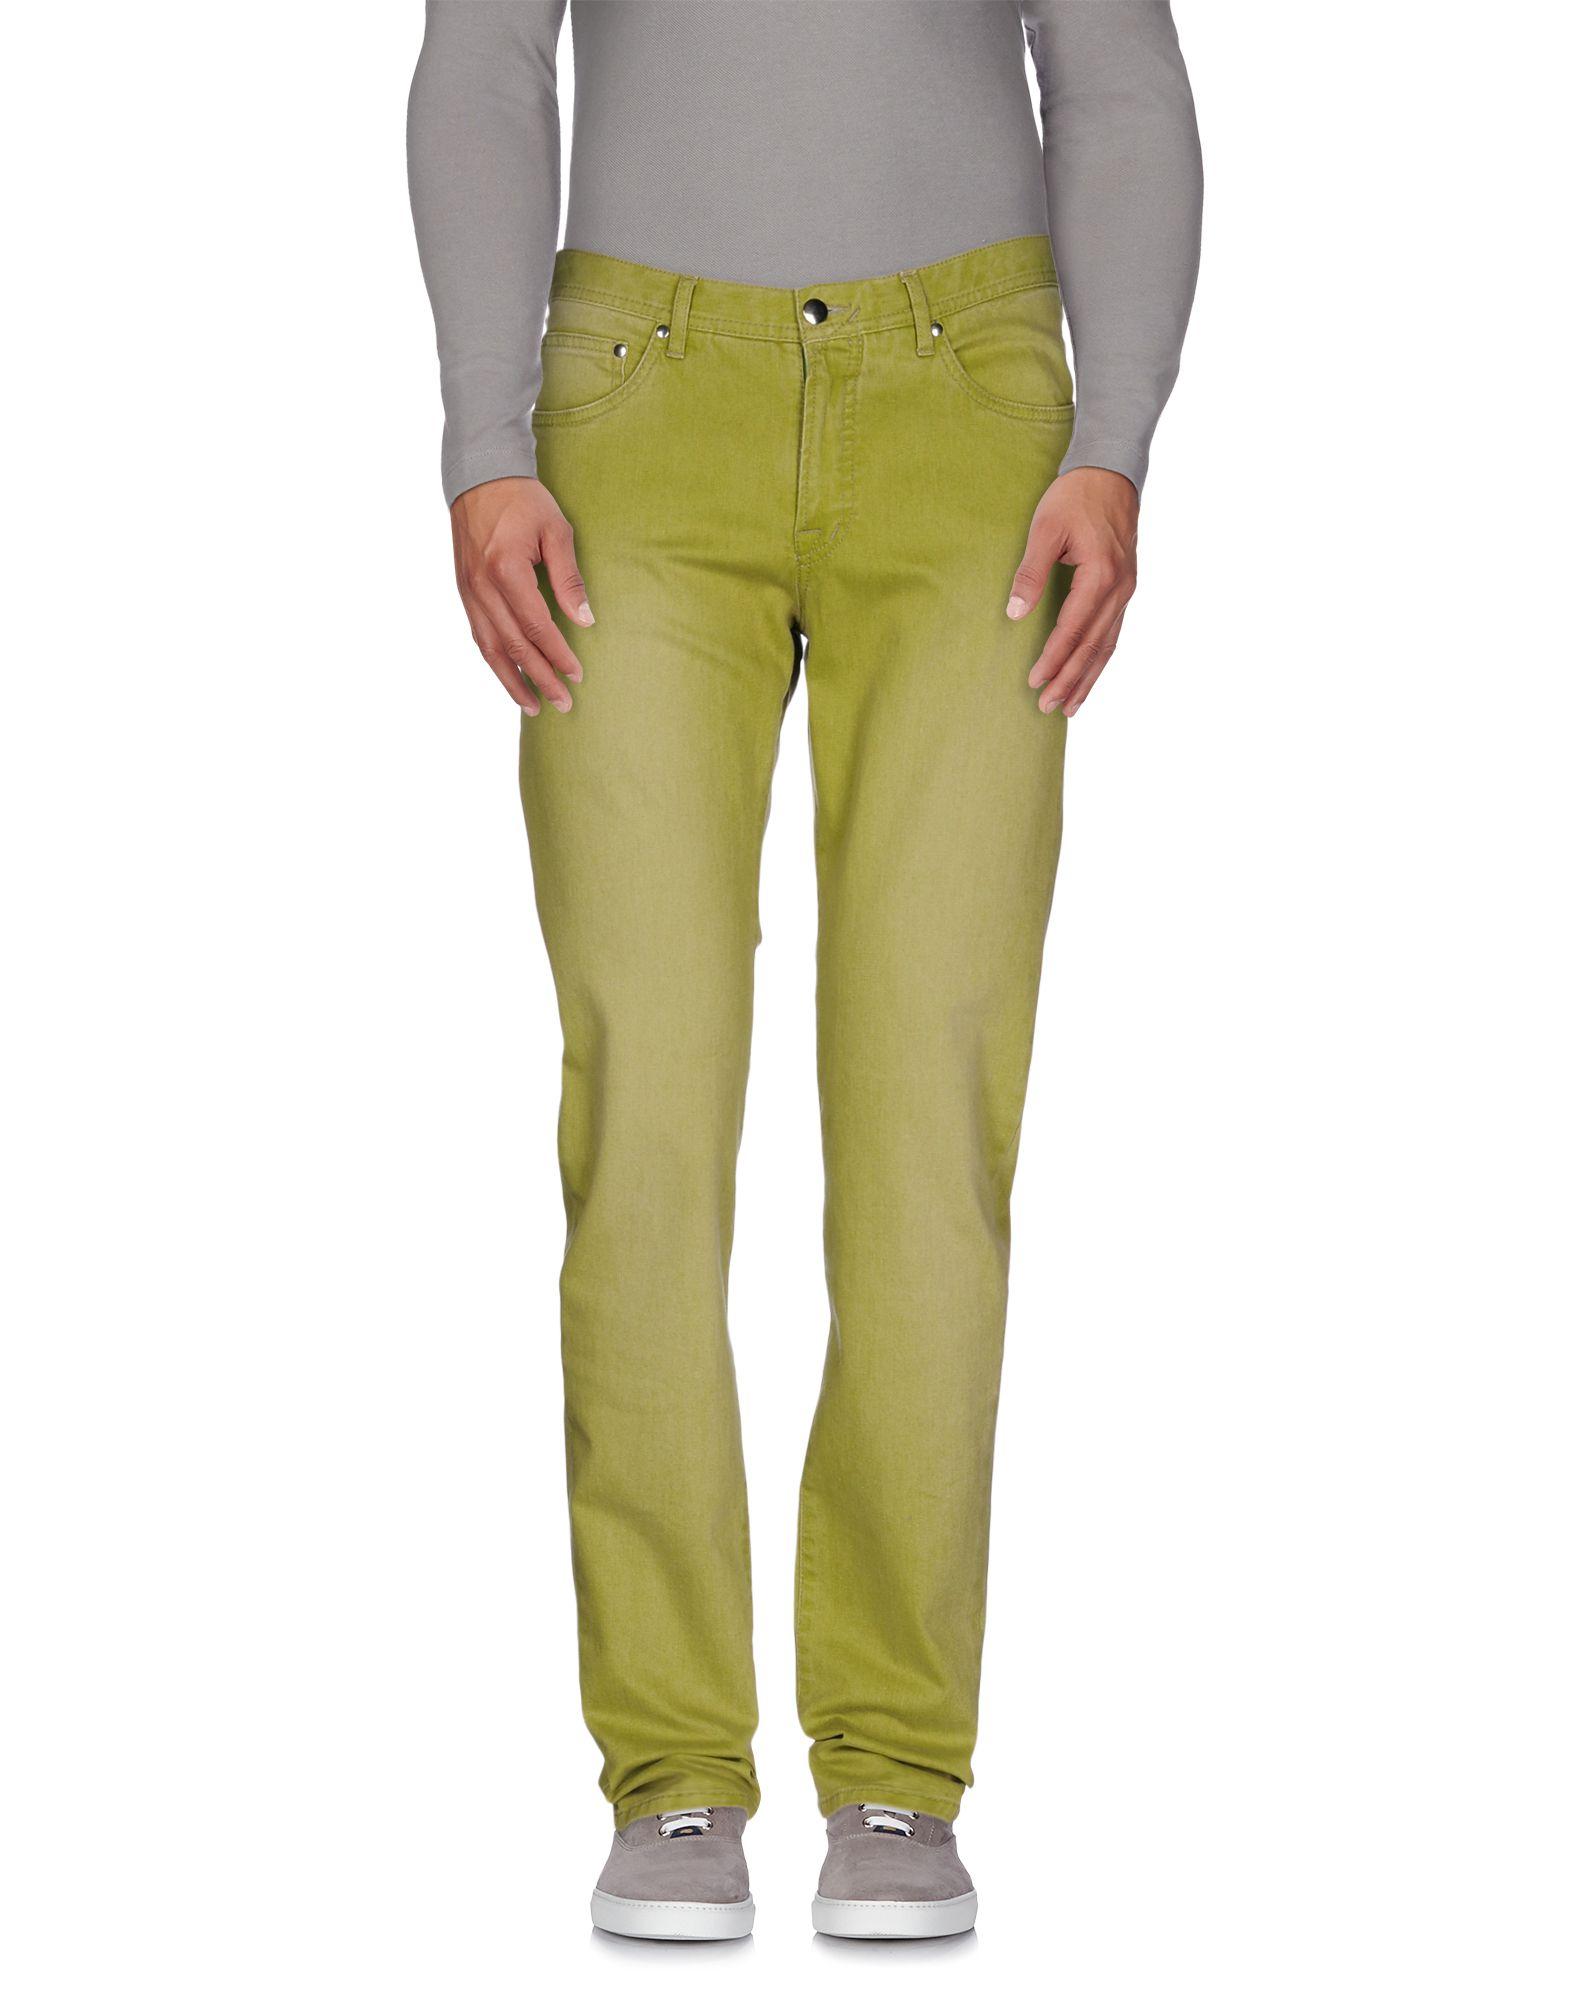 VIGANO' Jeans